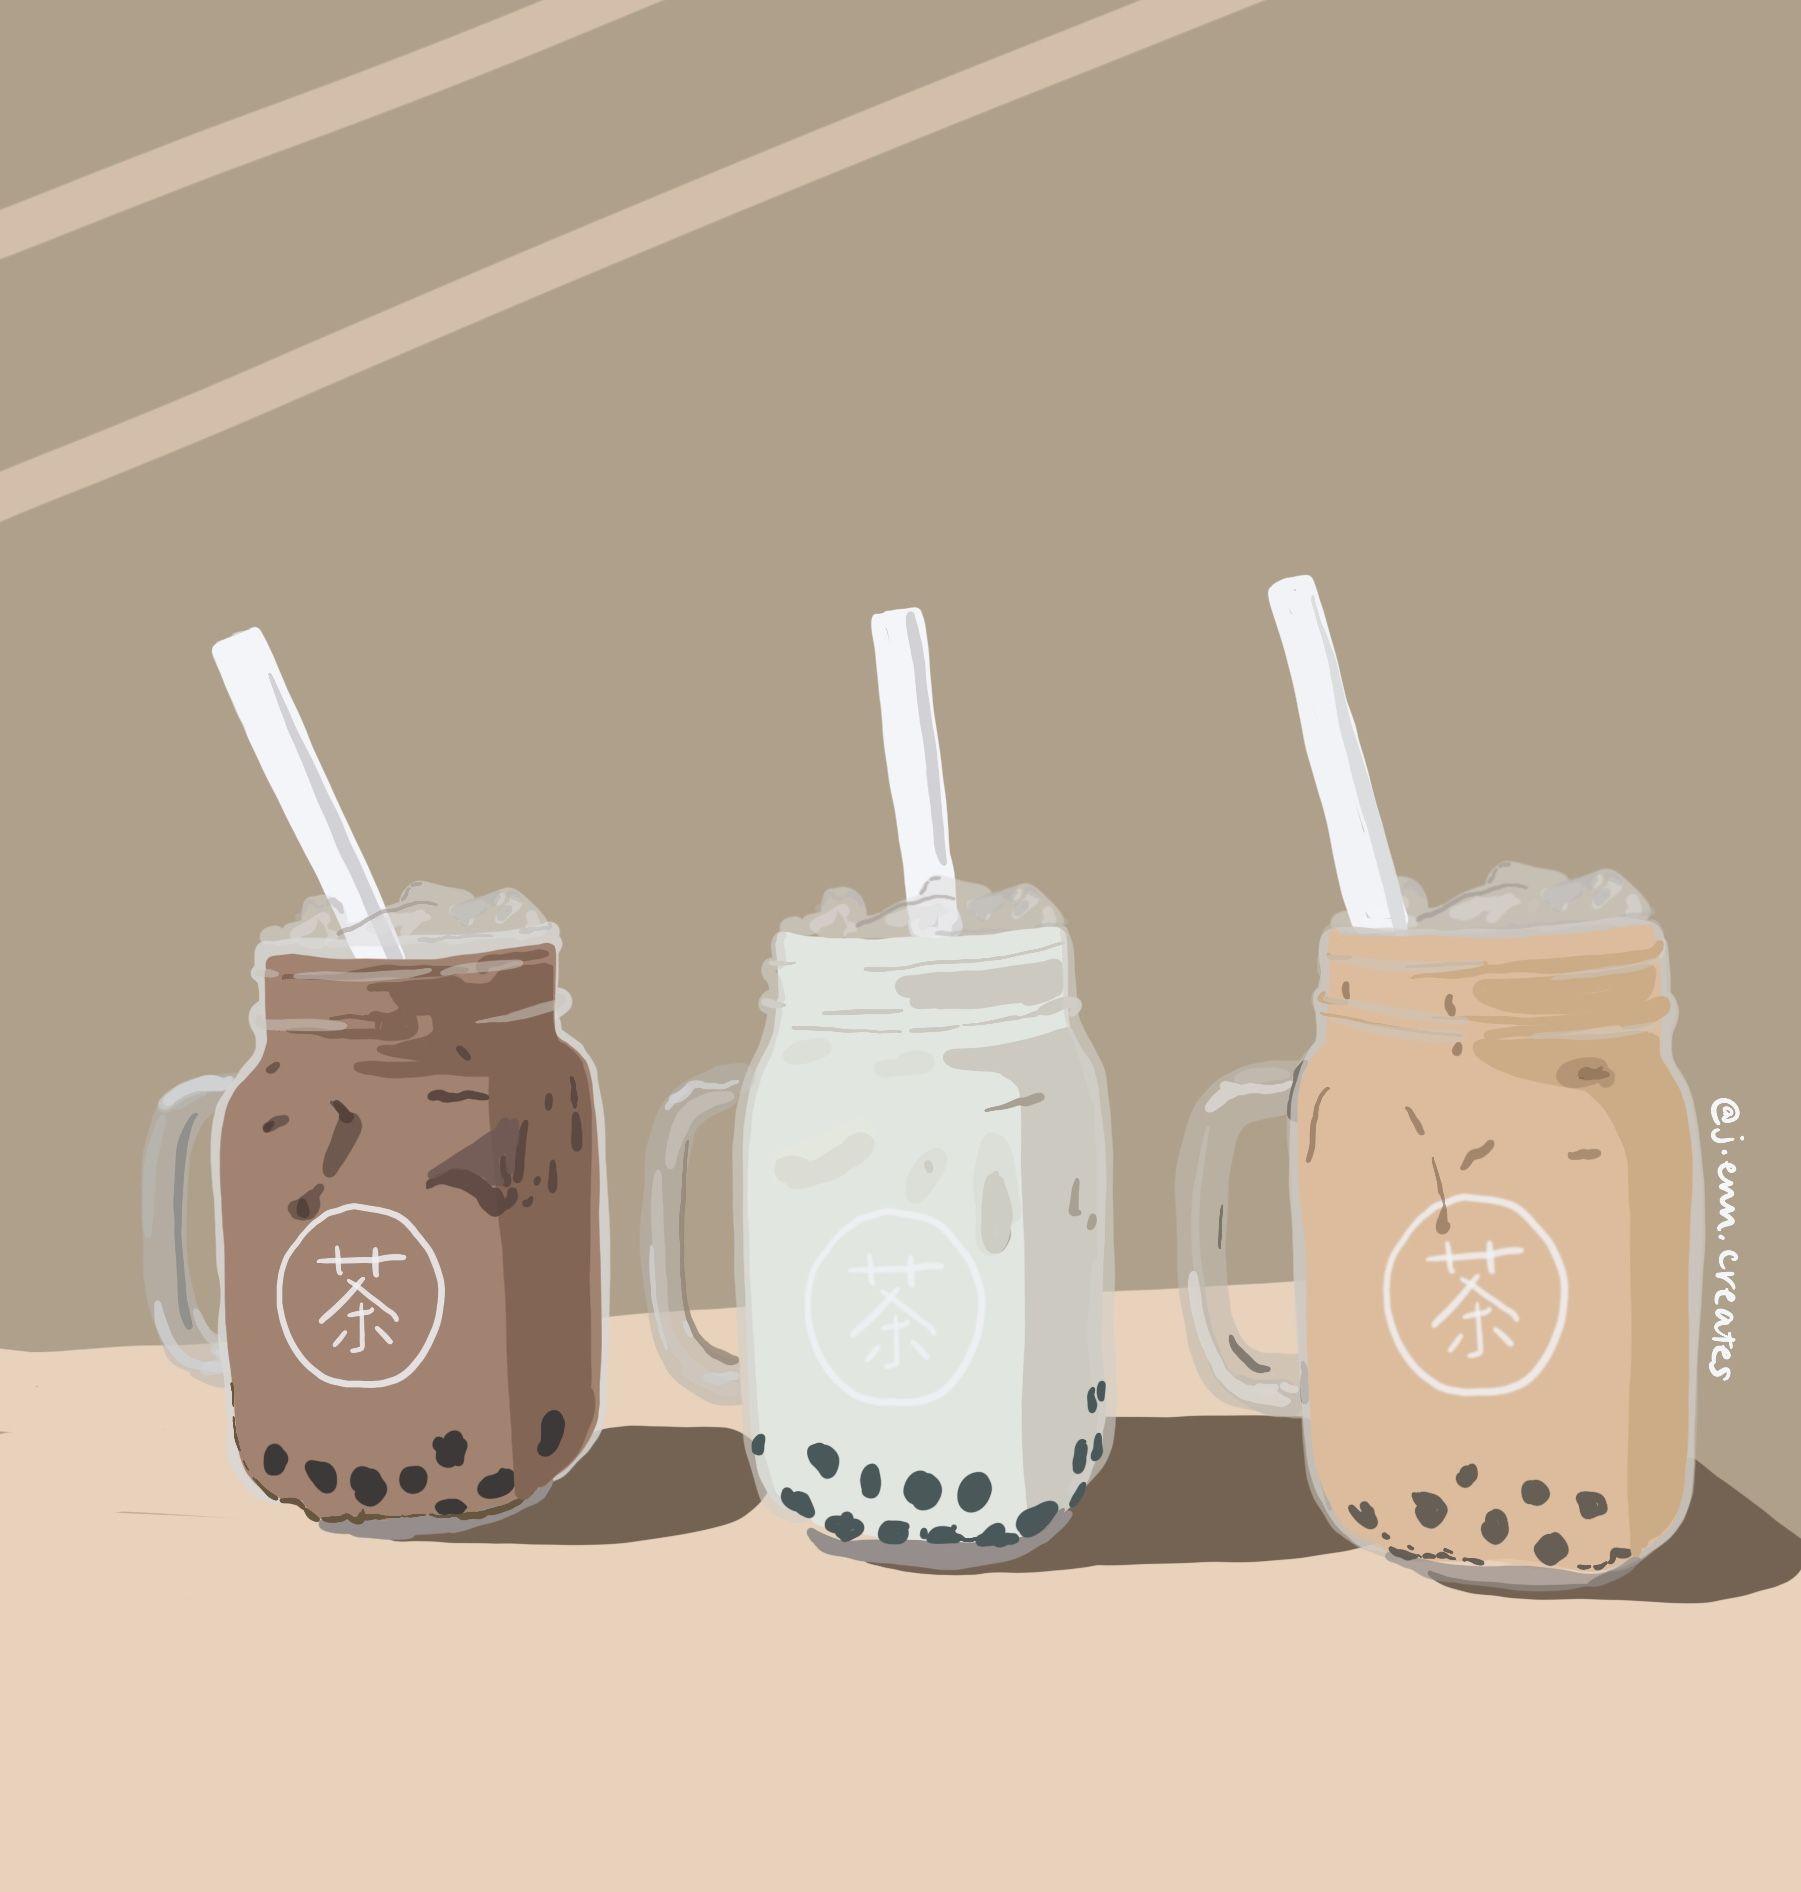 Boba bubble tea tapioca pearls custom drawing illustration ...